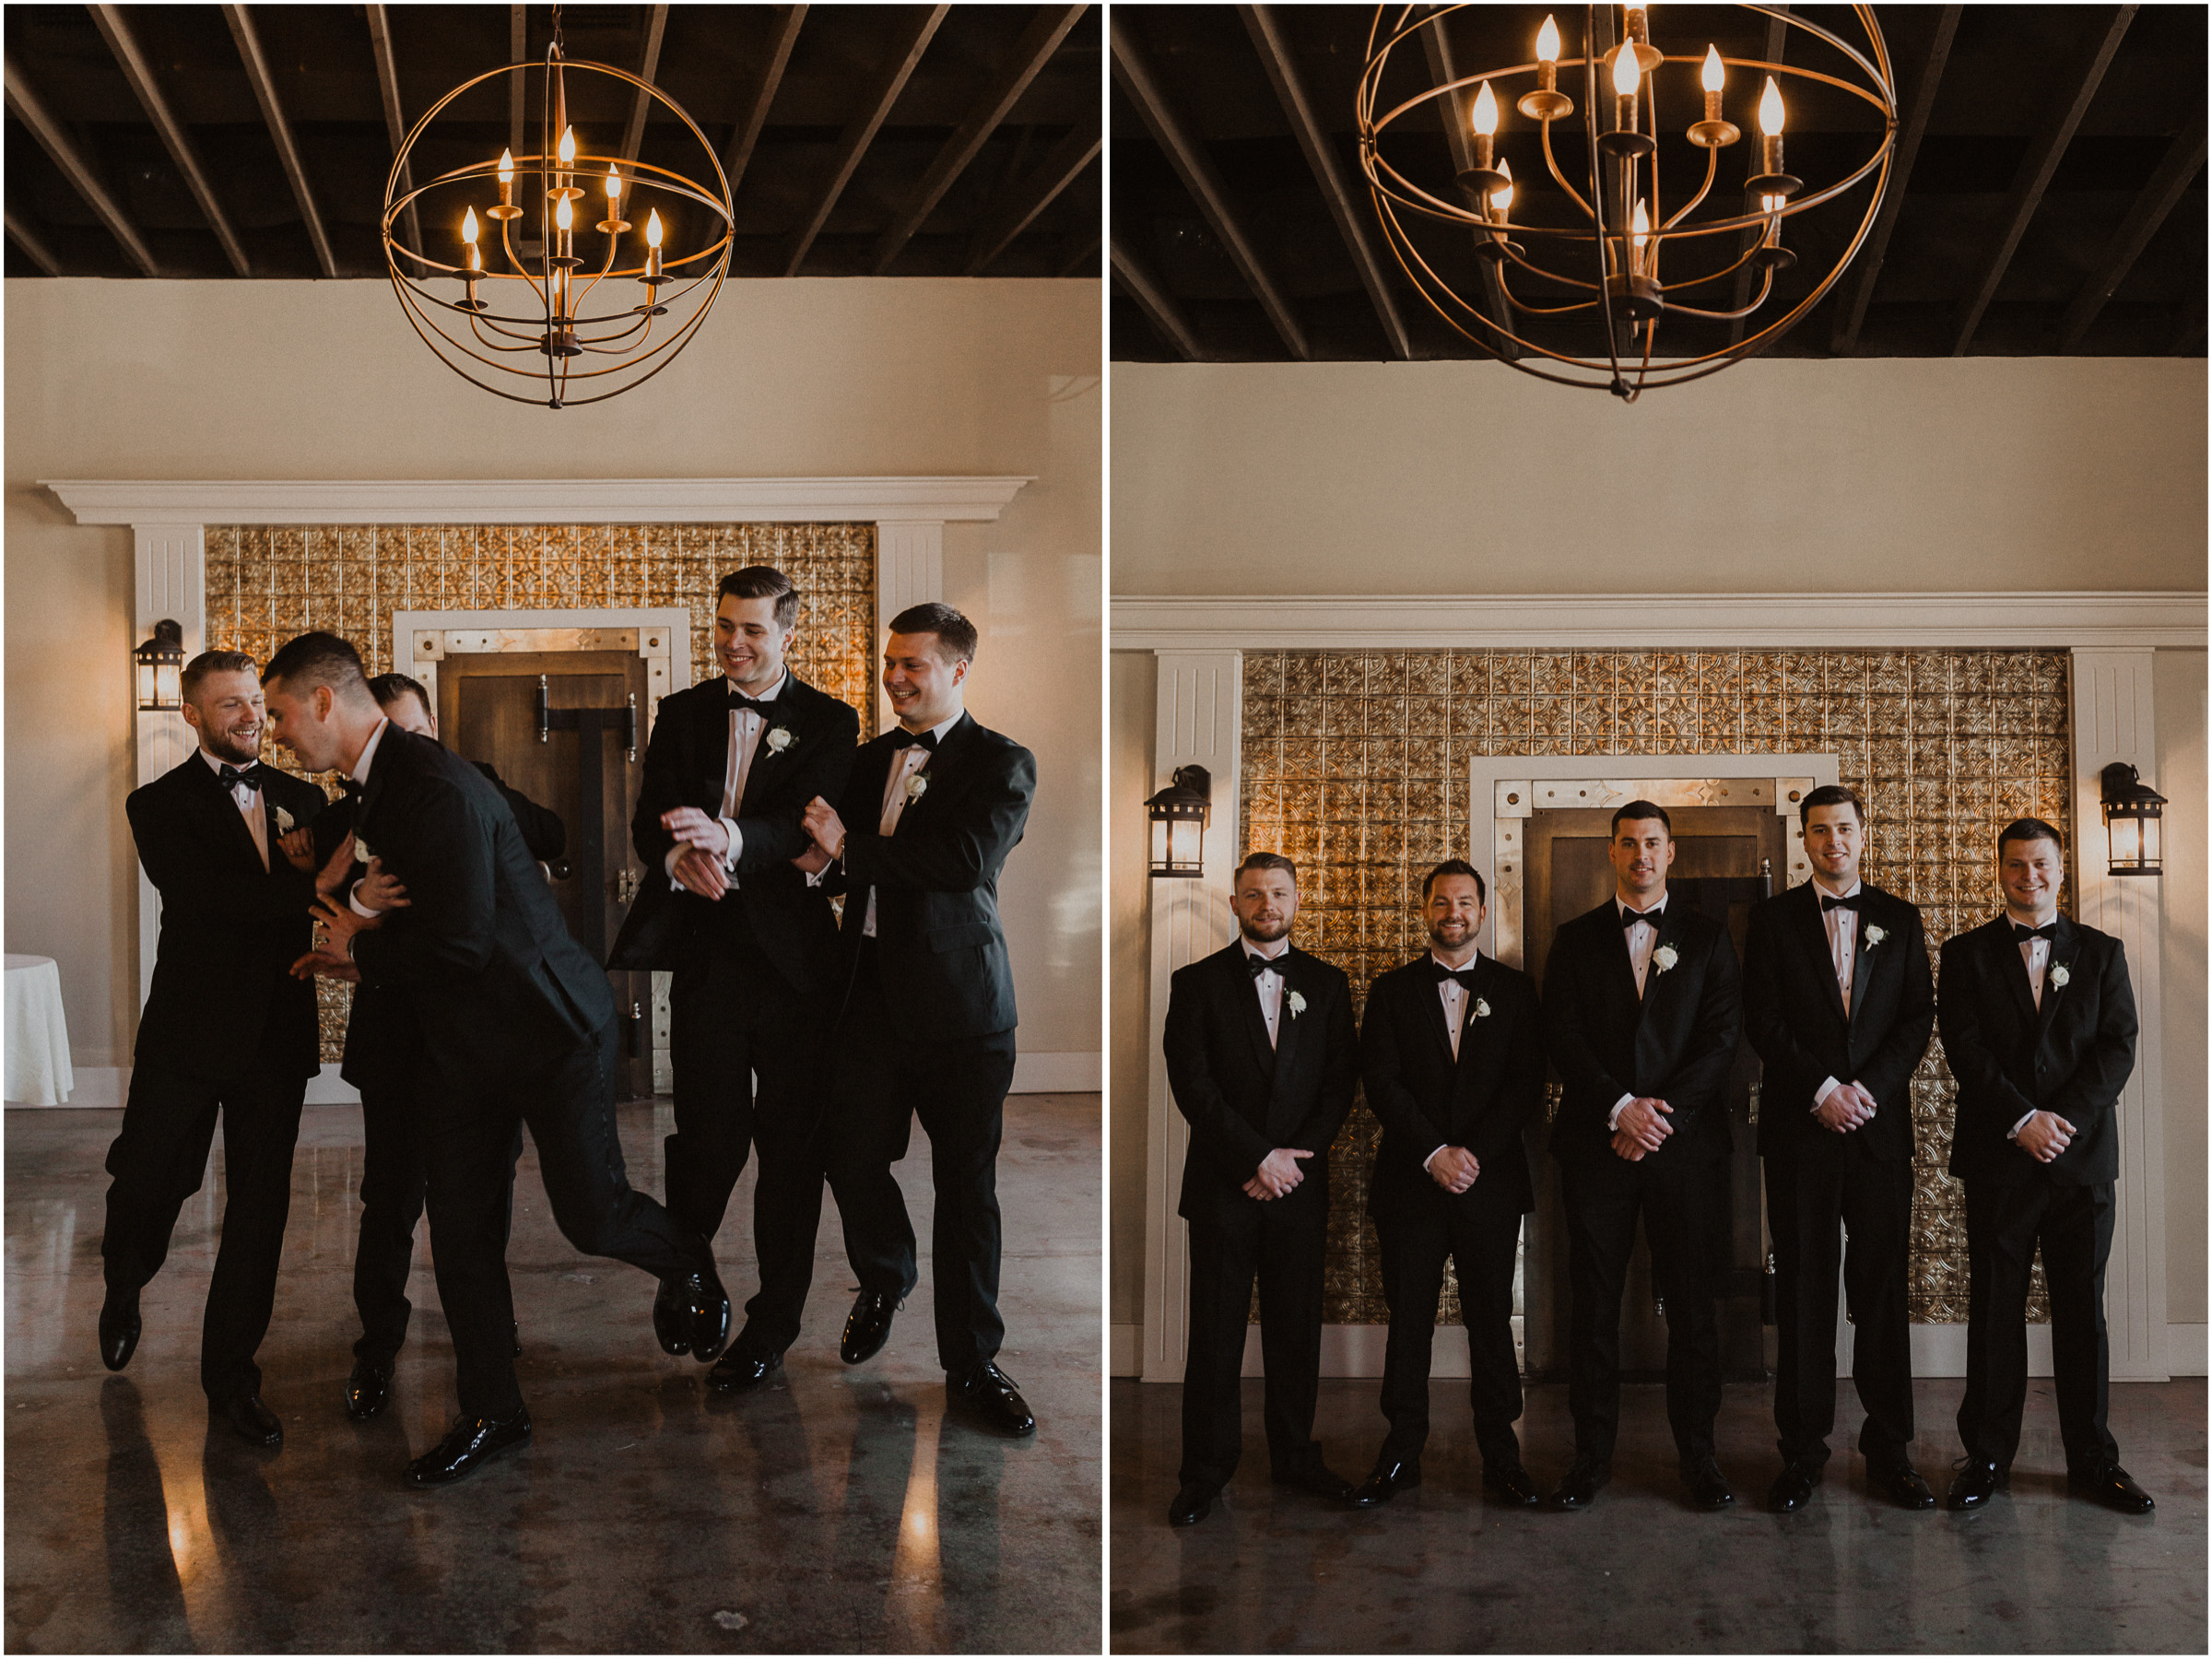 alyssa barletter photography shawnee mission park winter wedding 8th and main grandview missouri photographer-39.jpg